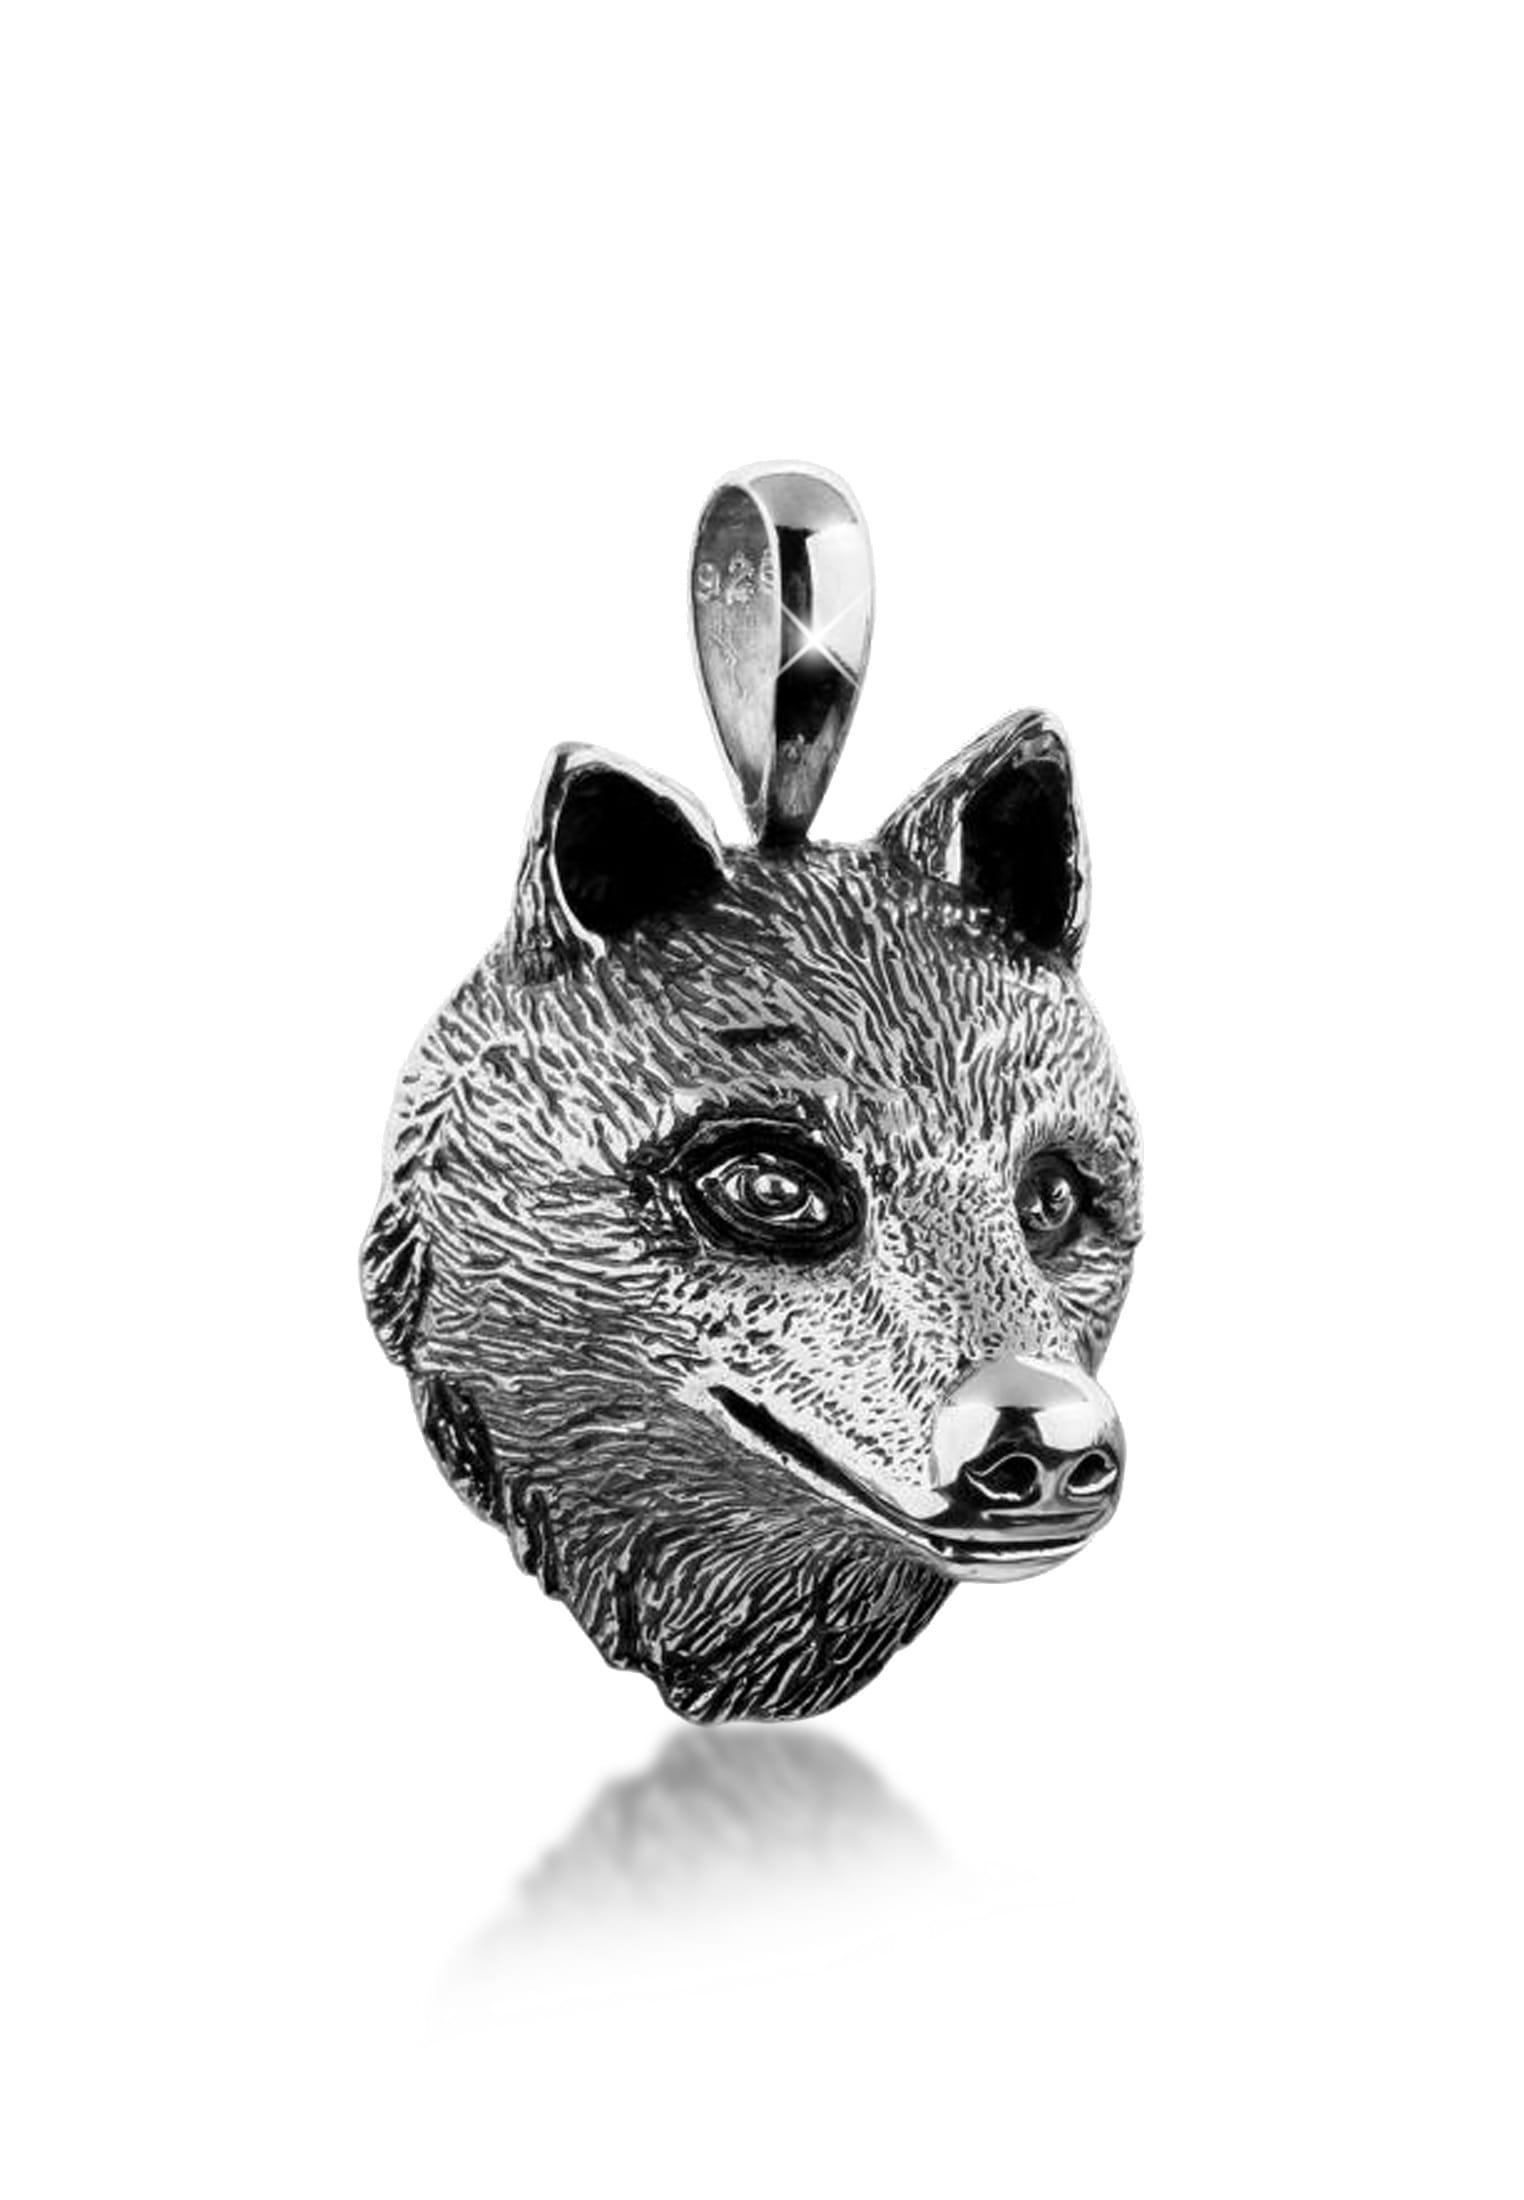 Kuzzoi Kettenanhänger Herren Wolfkopf Kettenanhänger Robust 925 Silber | Schmuck > Halsketten > Ketten ohne Anhänger | Kuzzoi